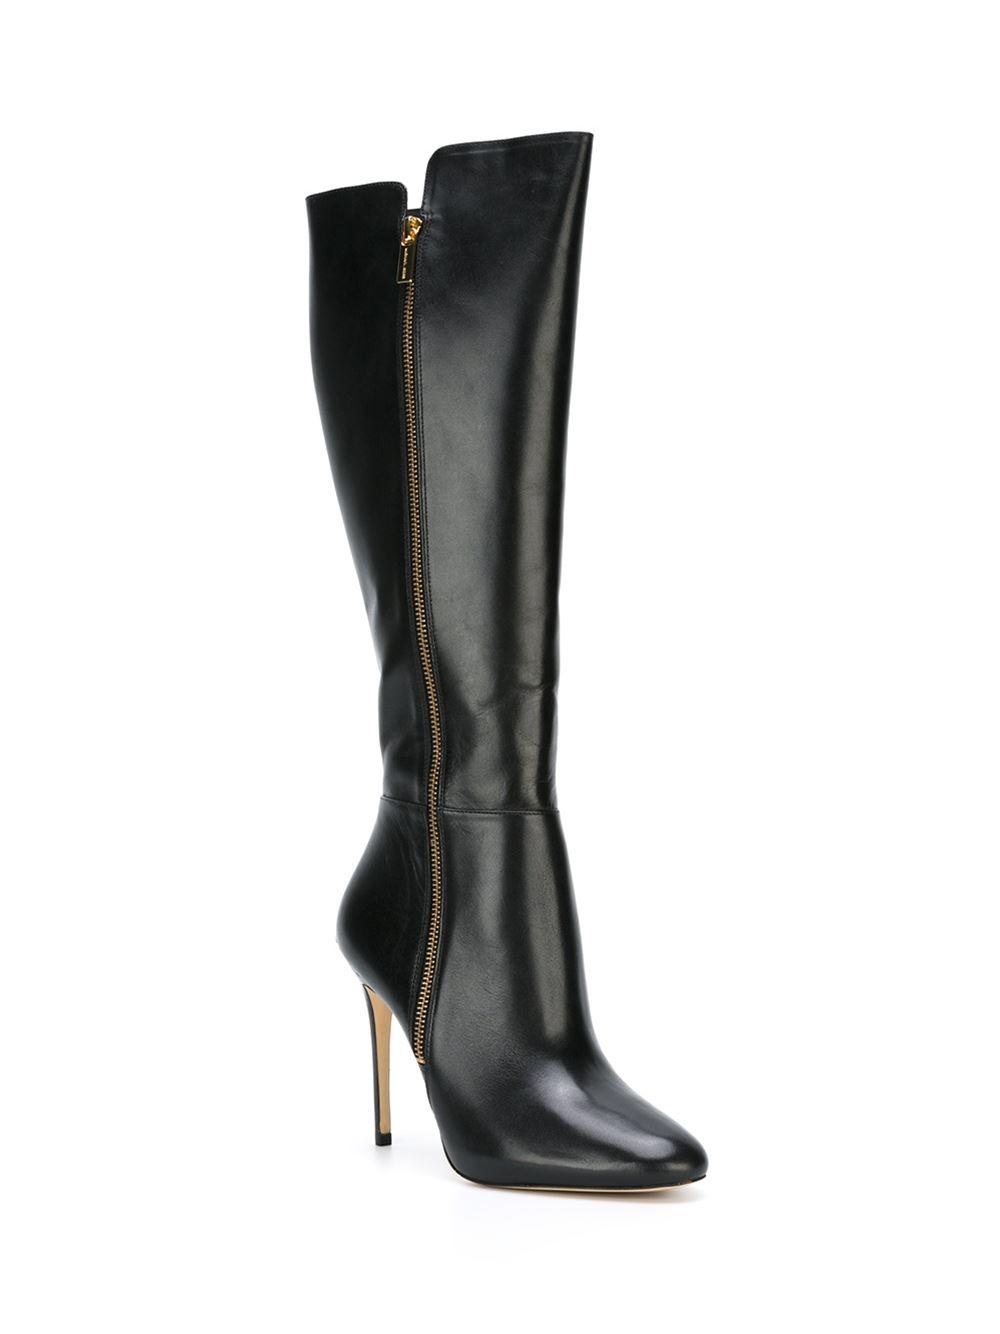 Michael michael kors Knee-High Stiletto Boots in Black | Lyst